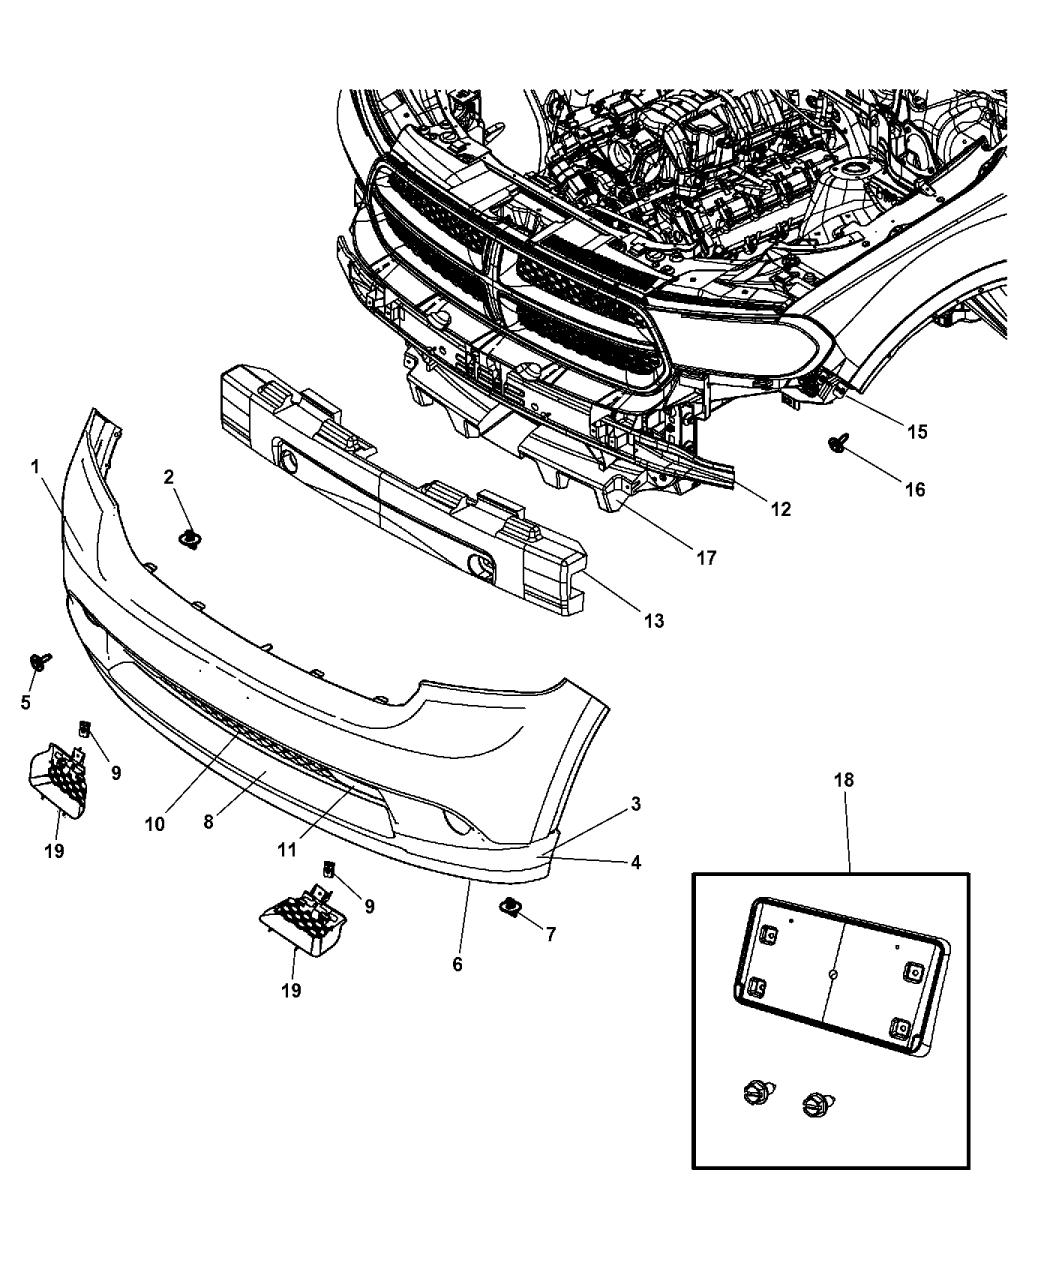 Dodge Durango Bumper Parts Diagram • Wiring Diagram For Free